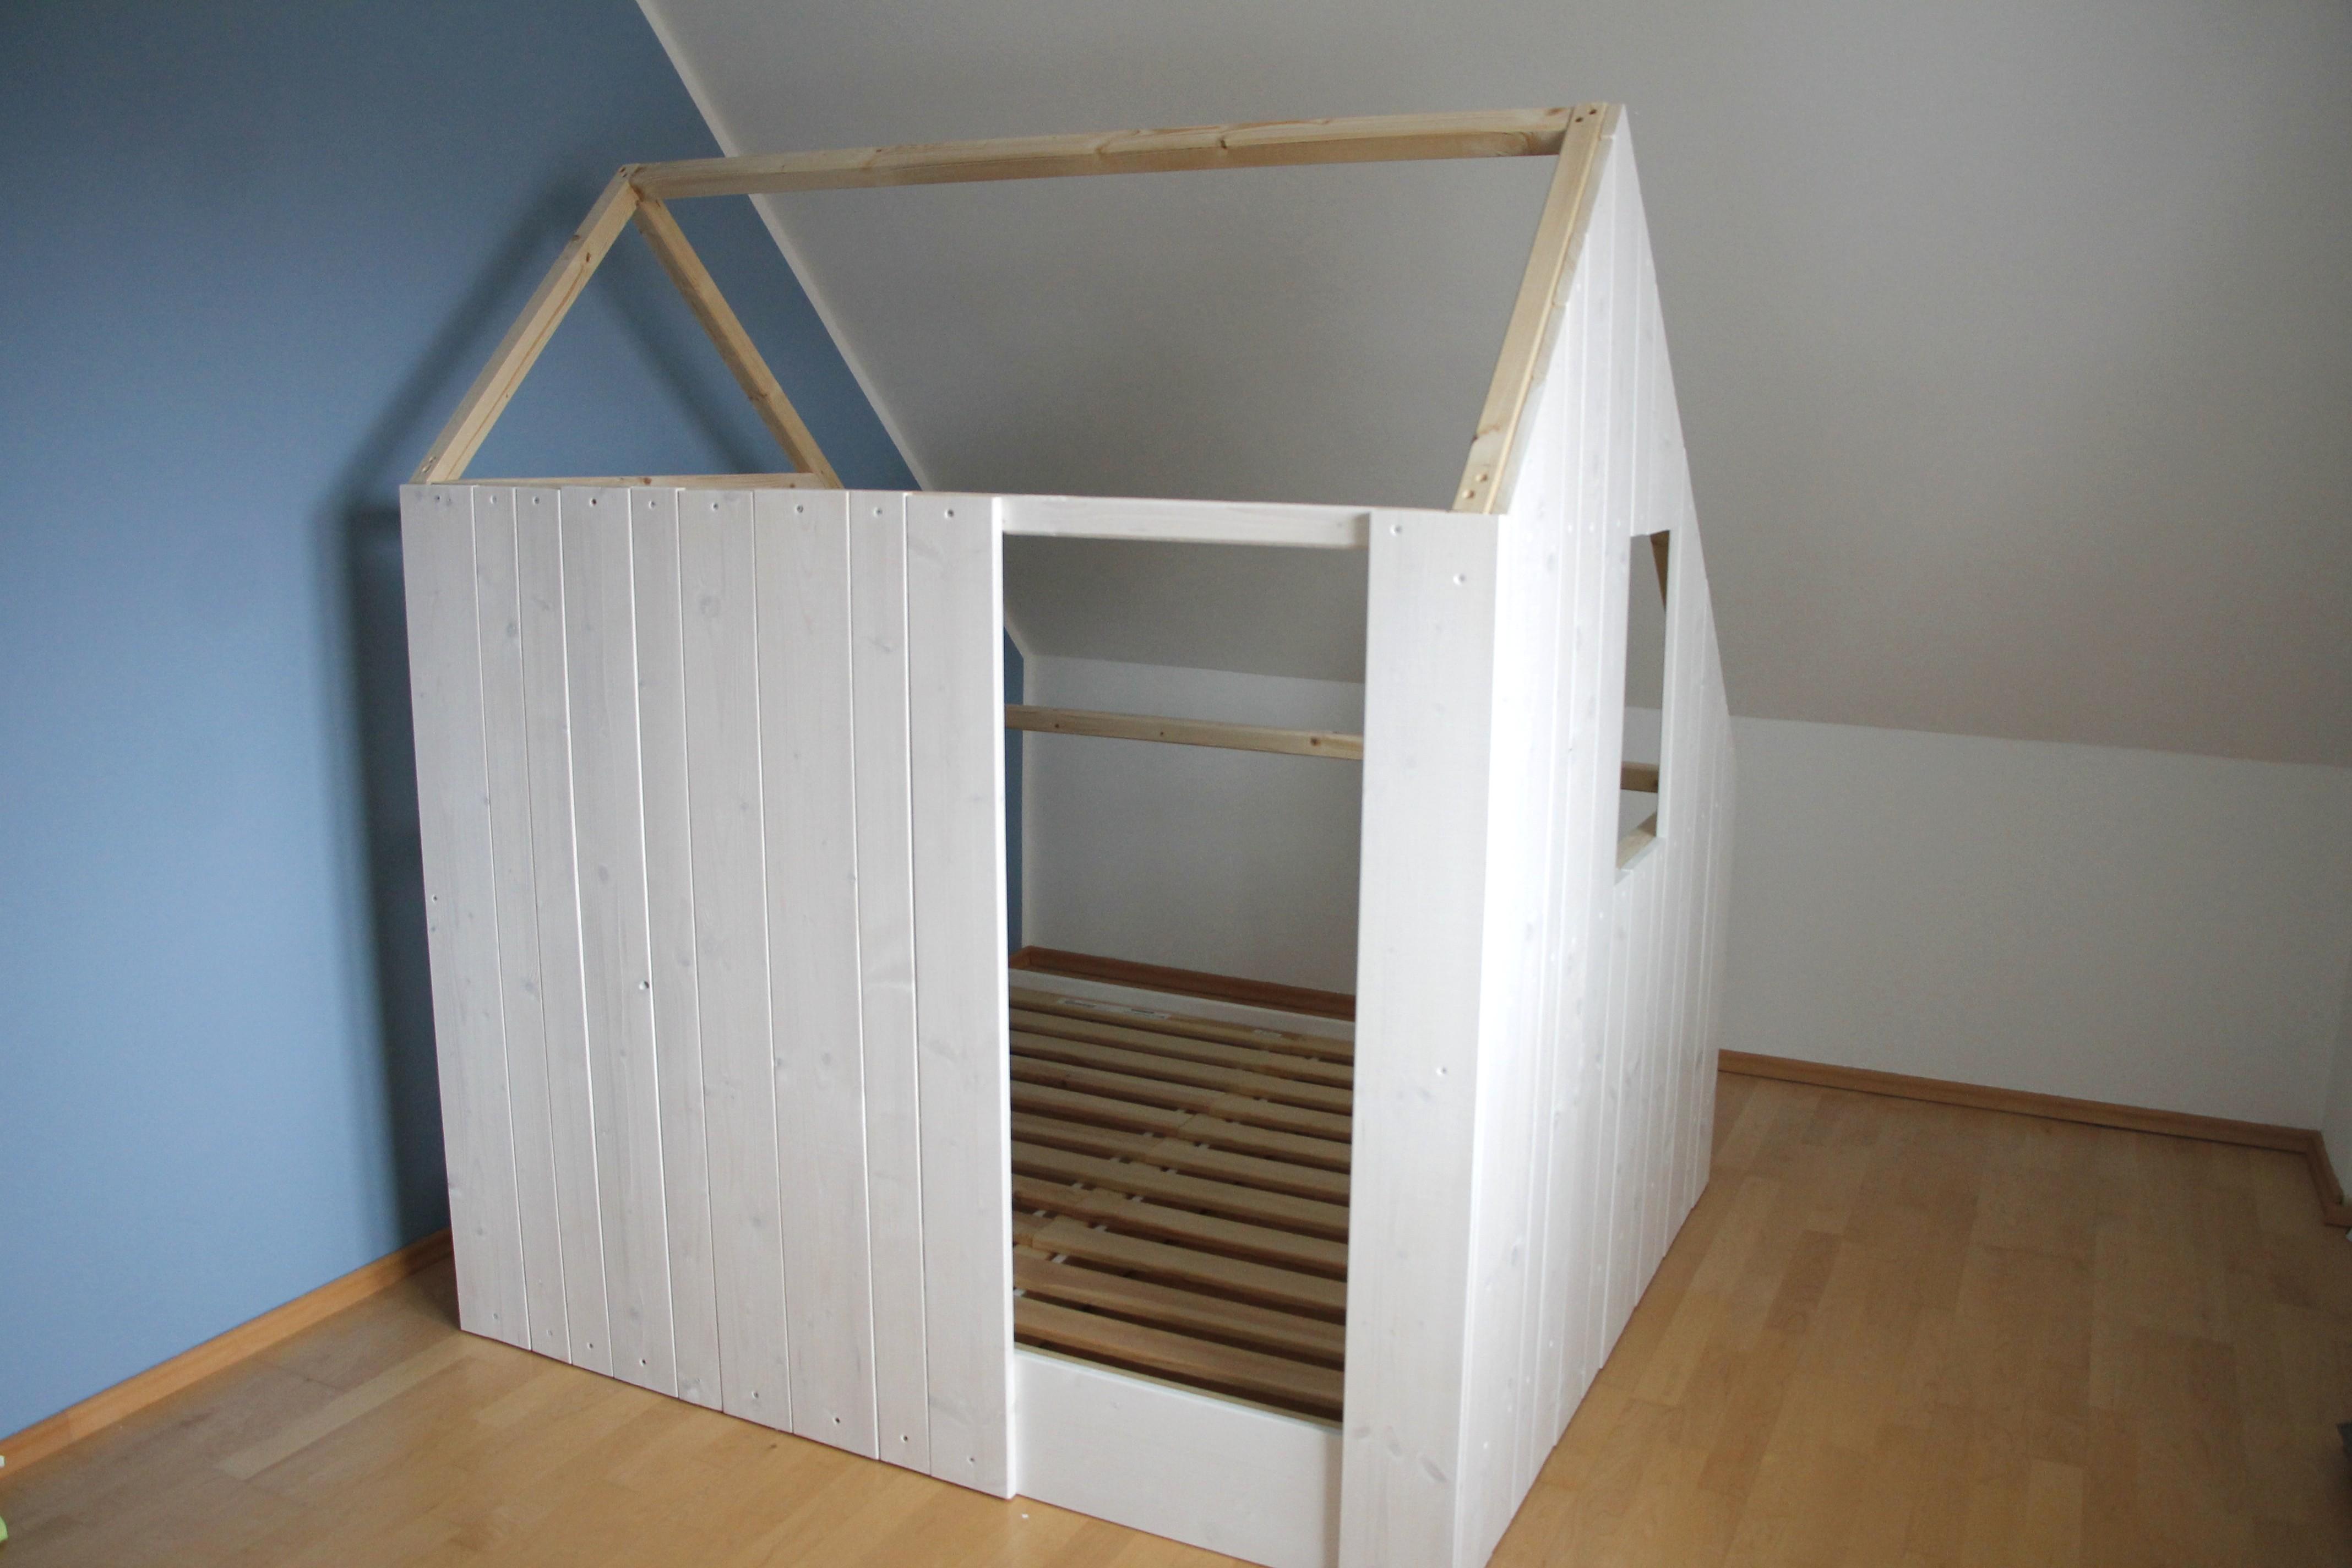 kinderzimmer einrichten ideen lavendelblog. Black Bedroom Furniture Sets. Home Design Ideas